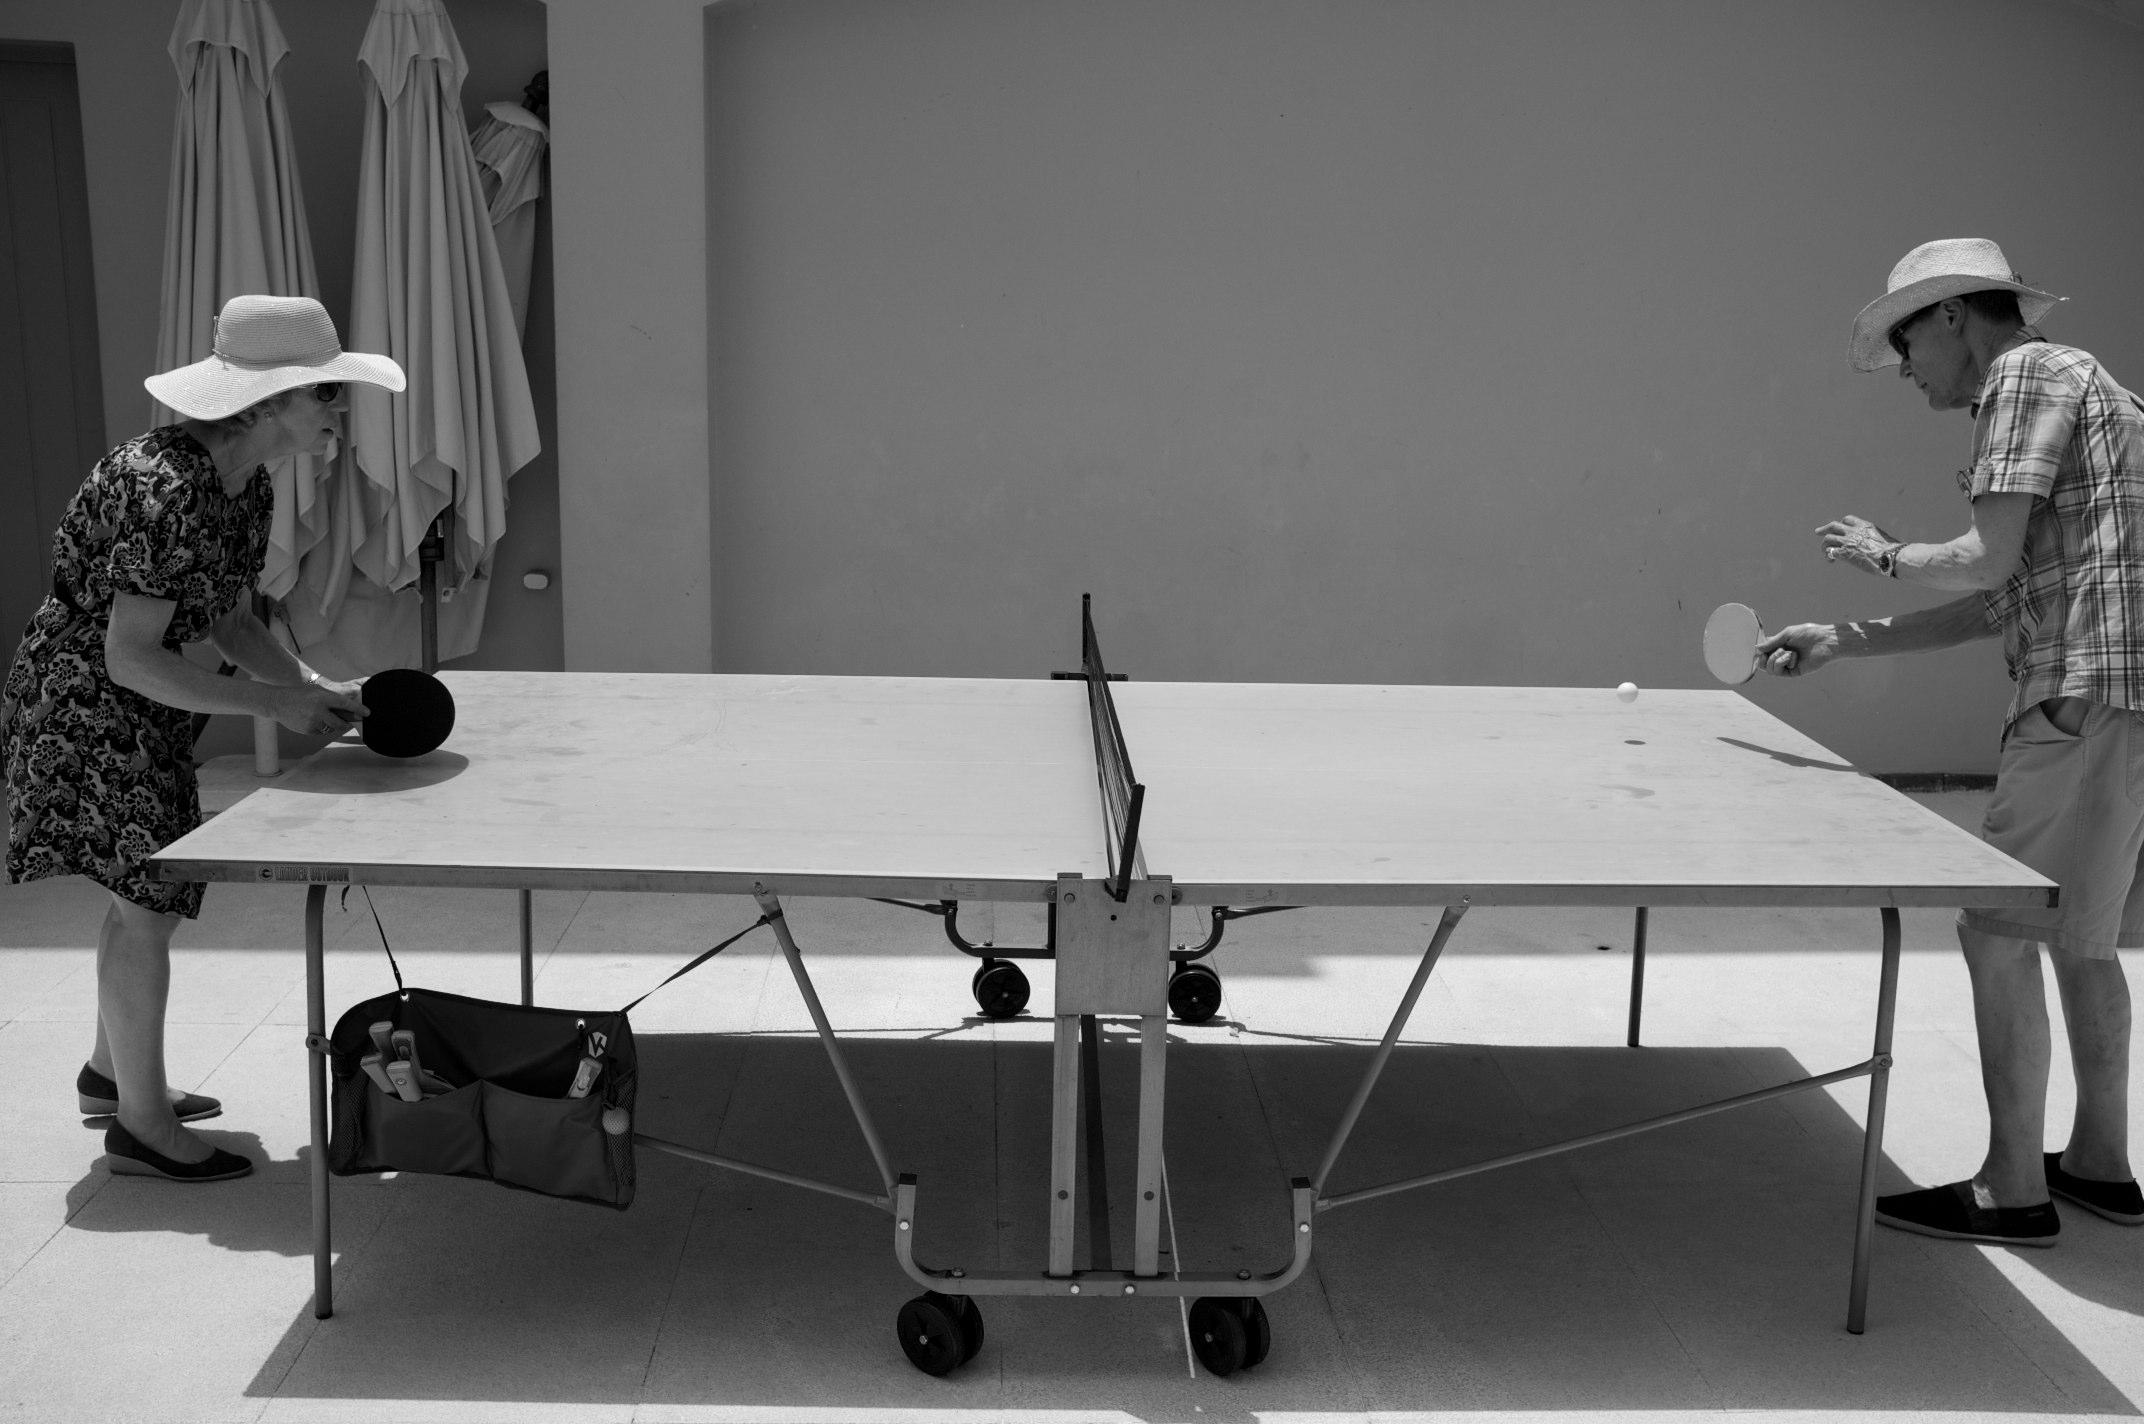 ping pong startups accelerators